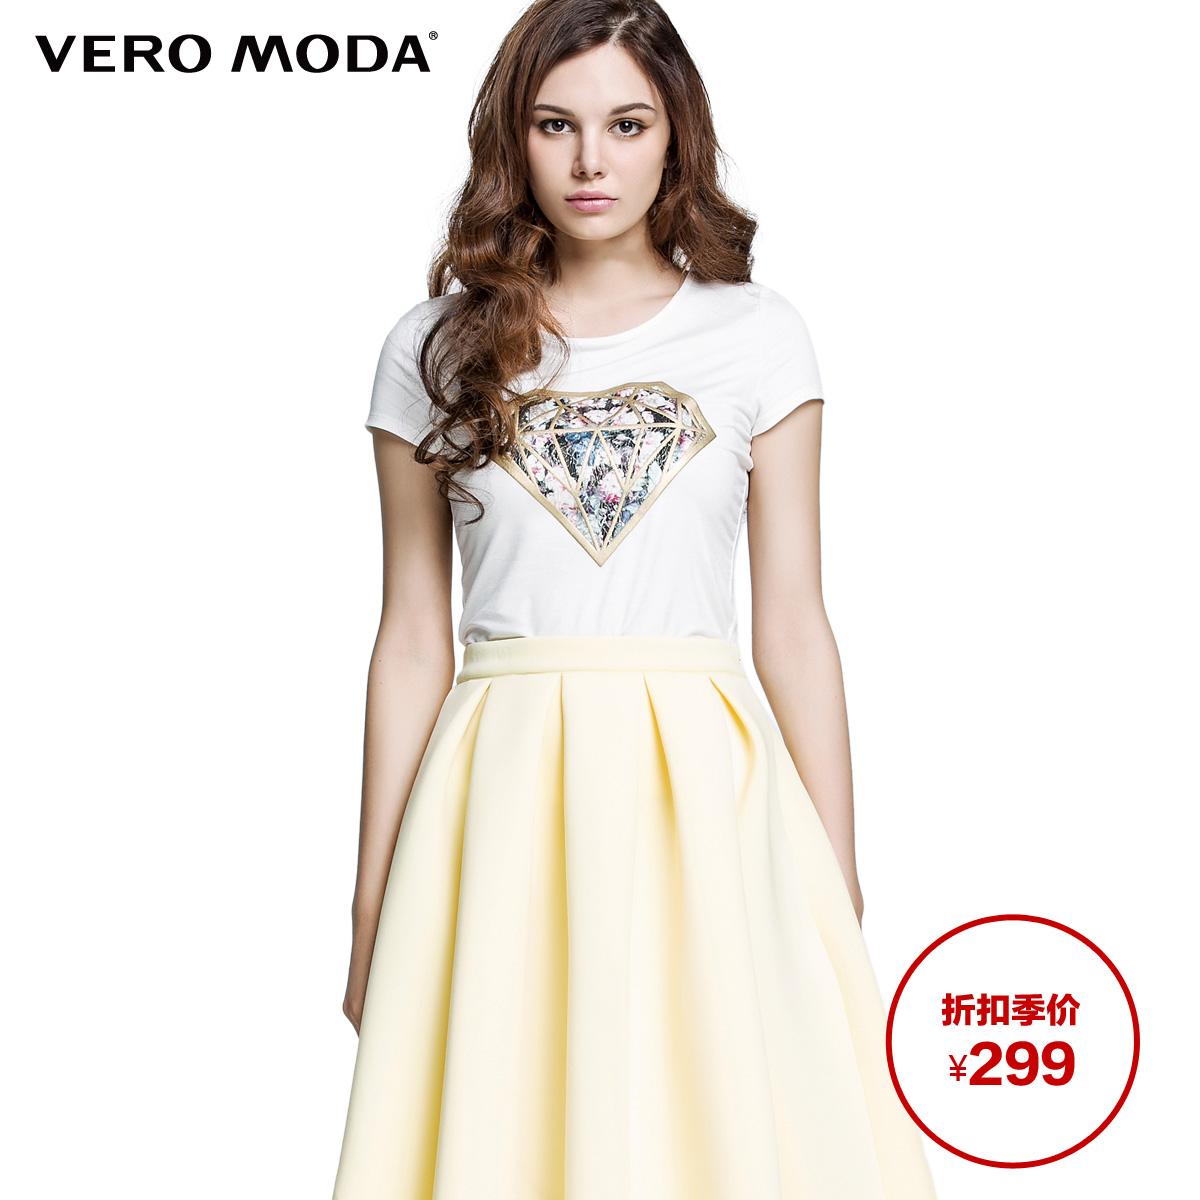 Футболка VERO MODA 315201190 299 футболка vero moda цвет черный